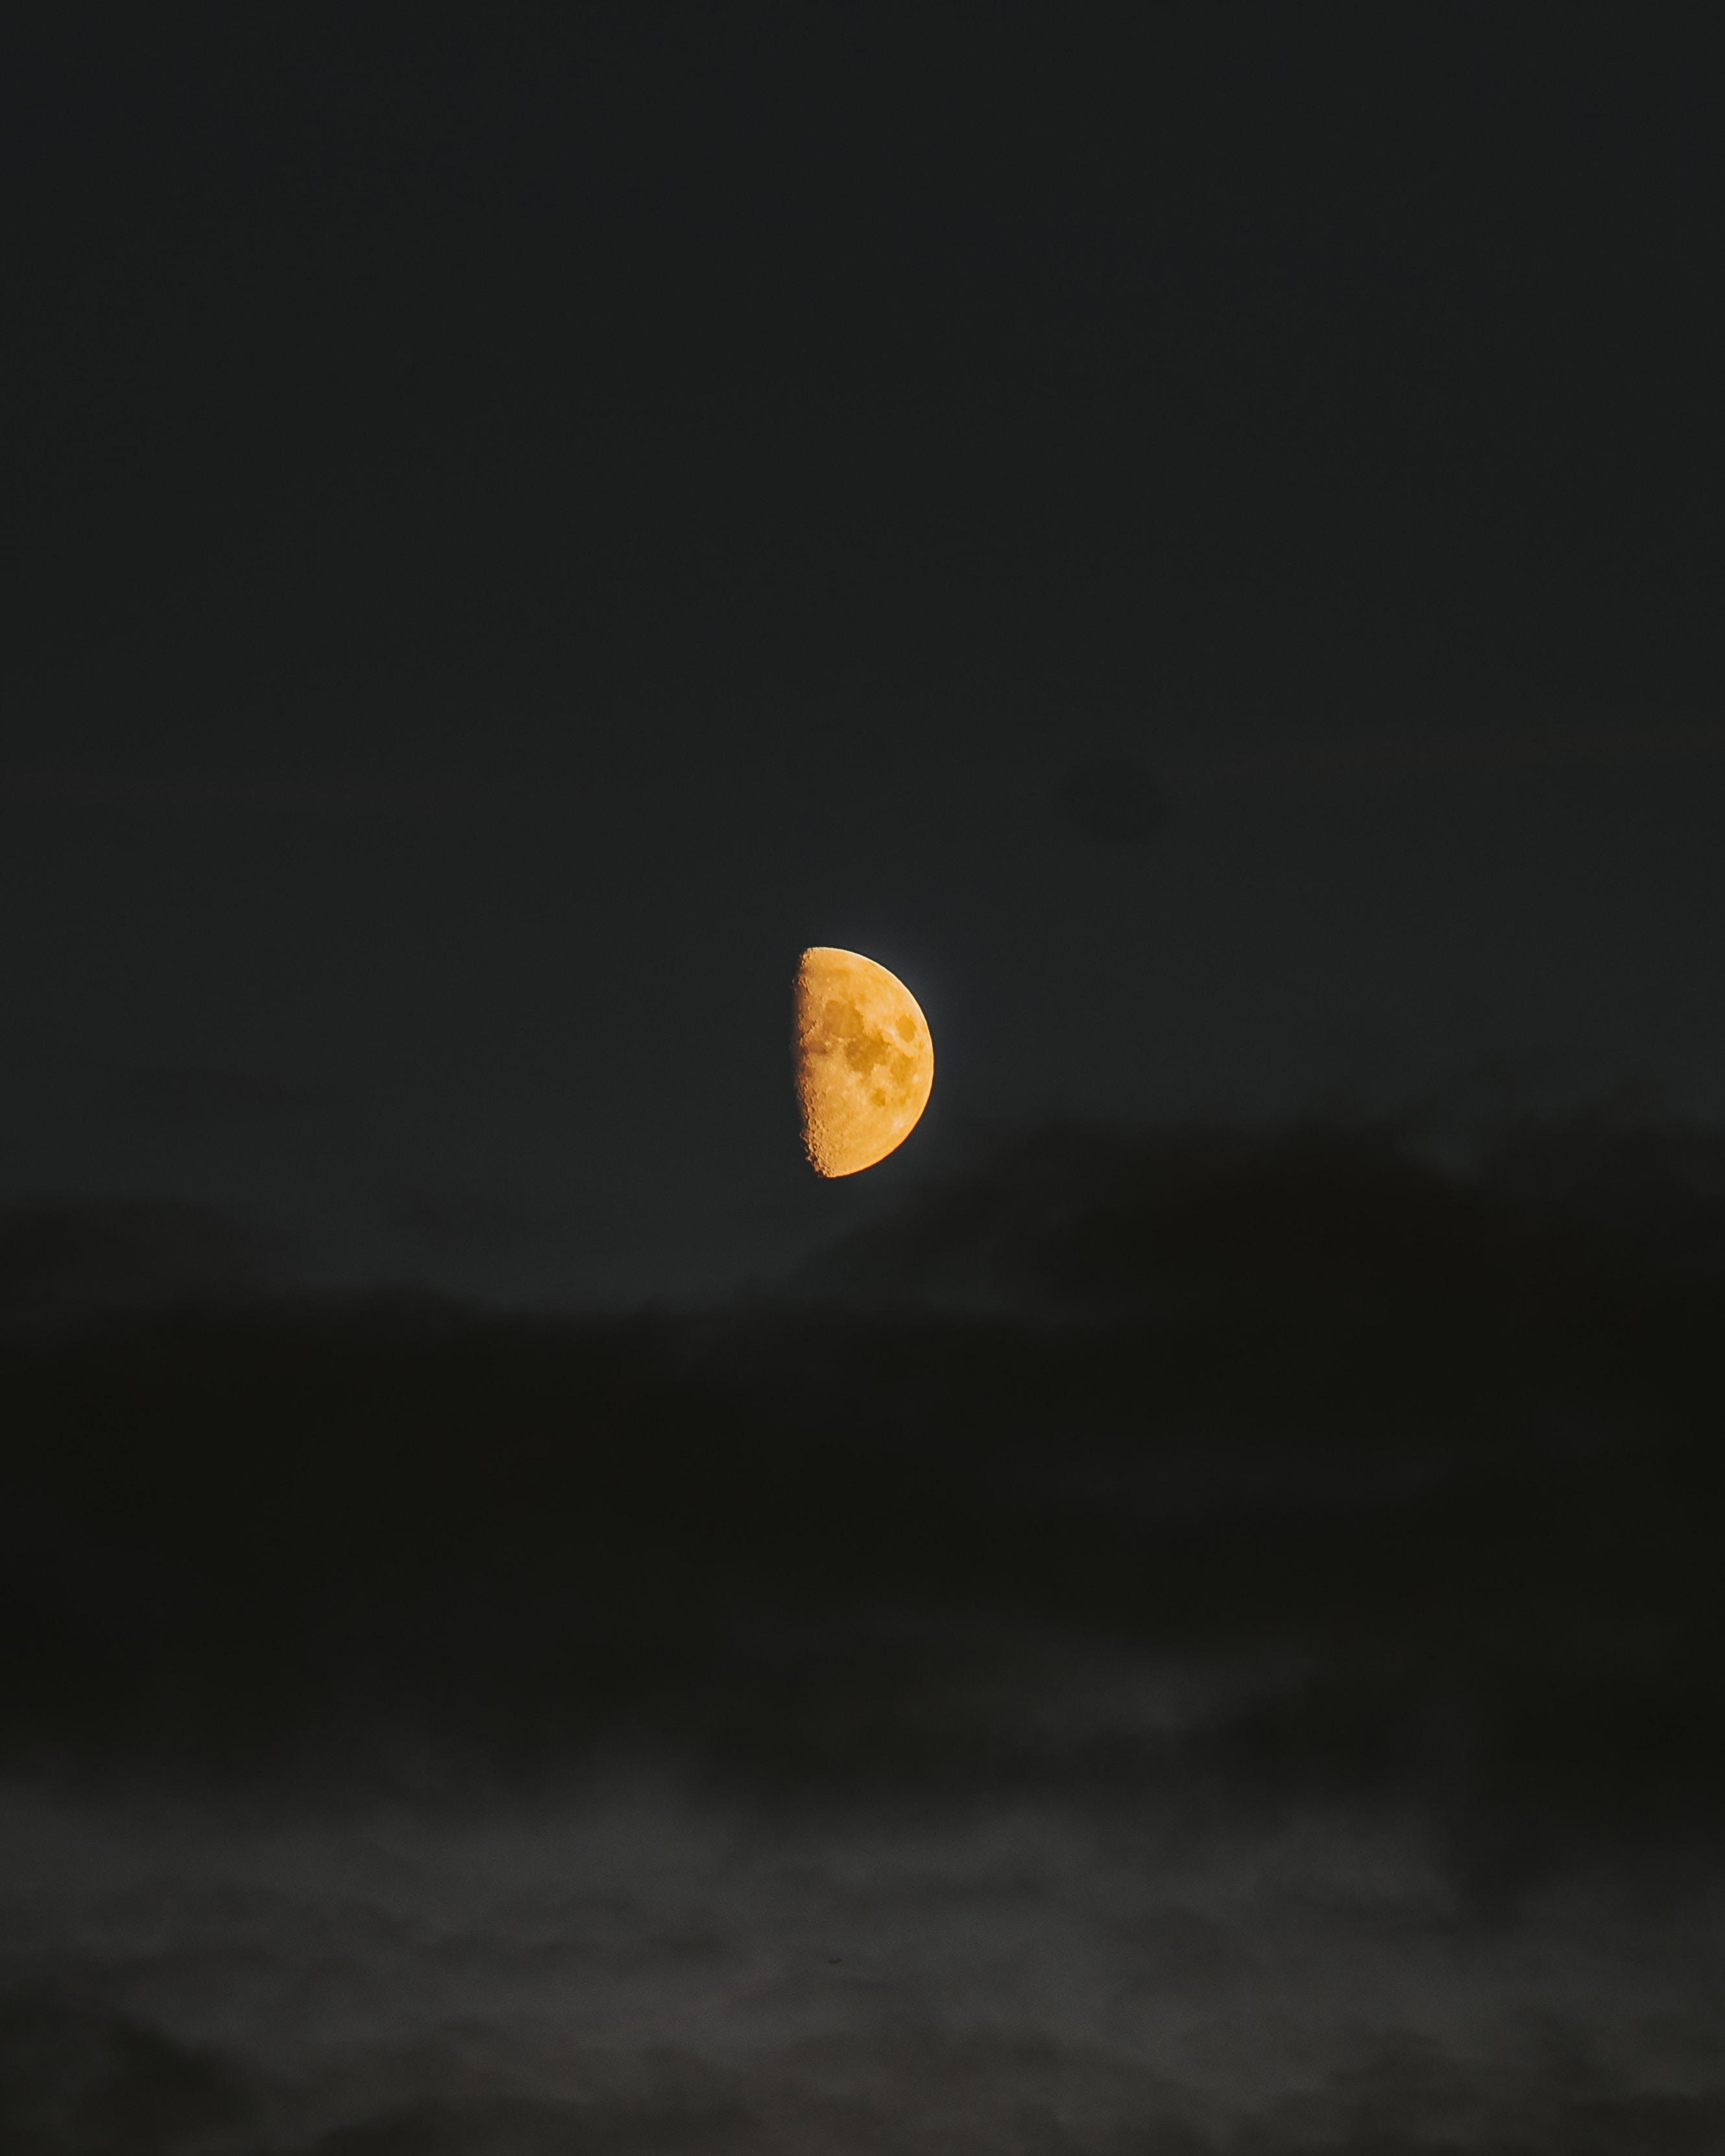 Moon stare.